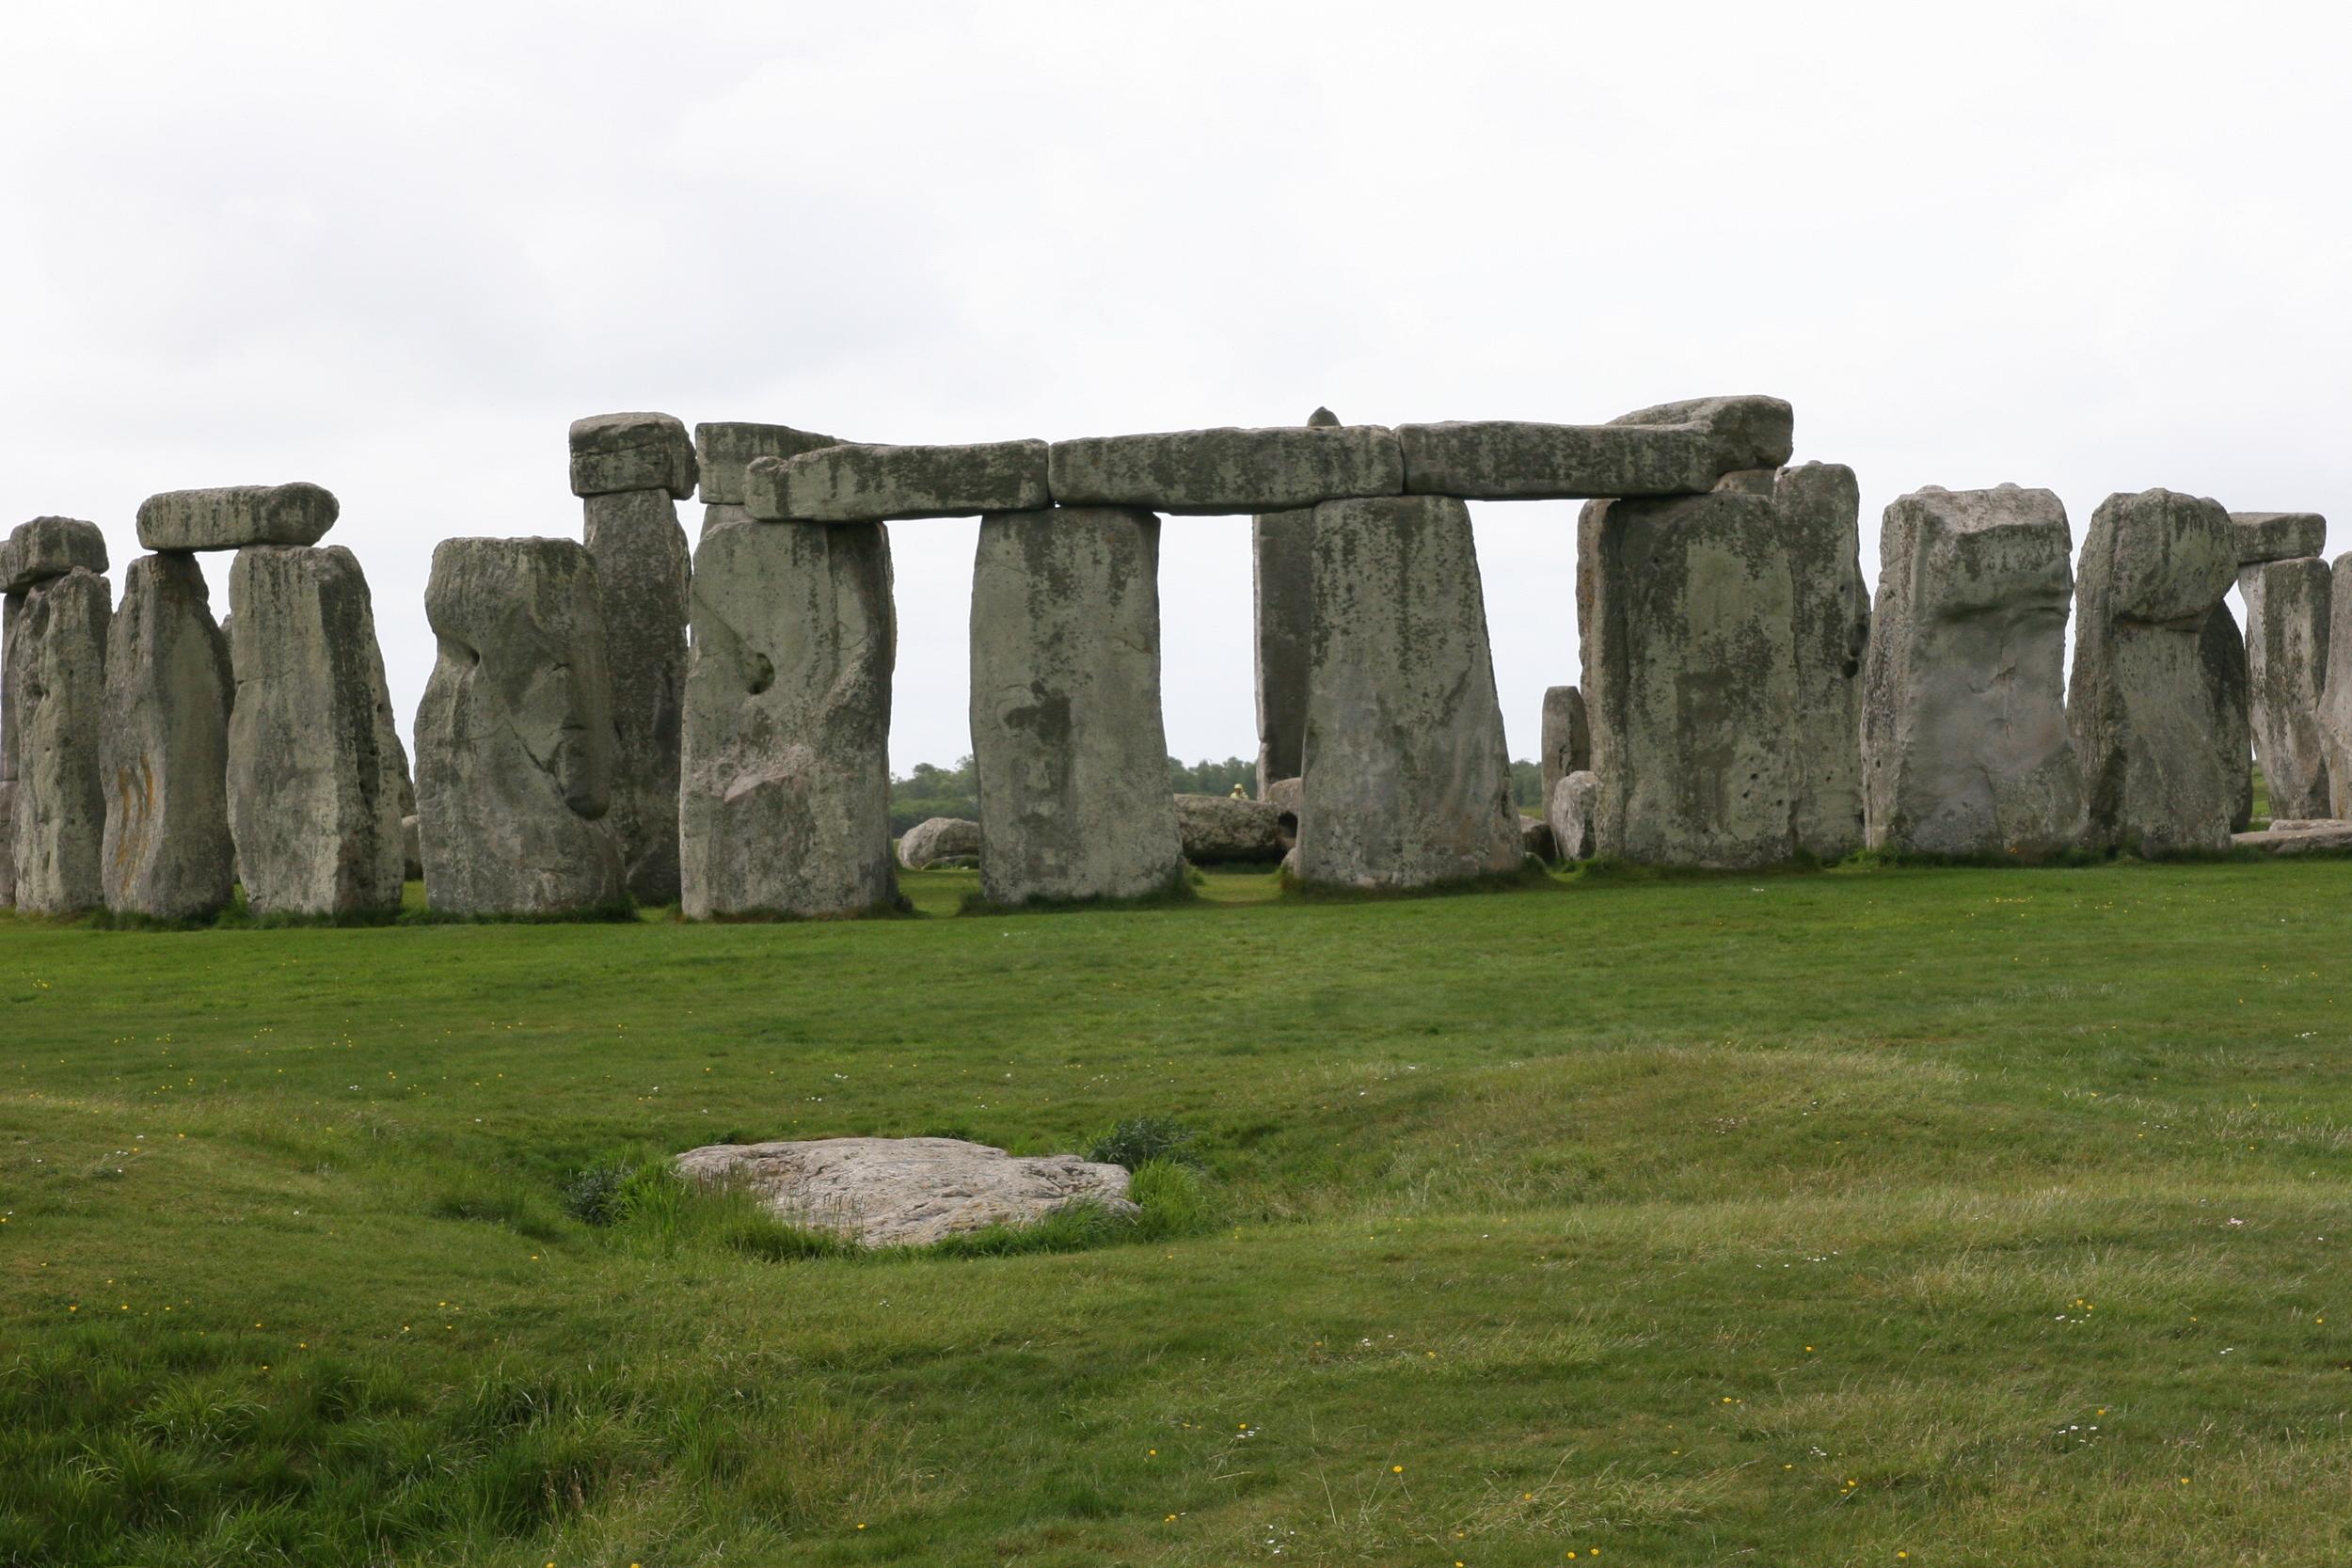 Discovering Stonehenge